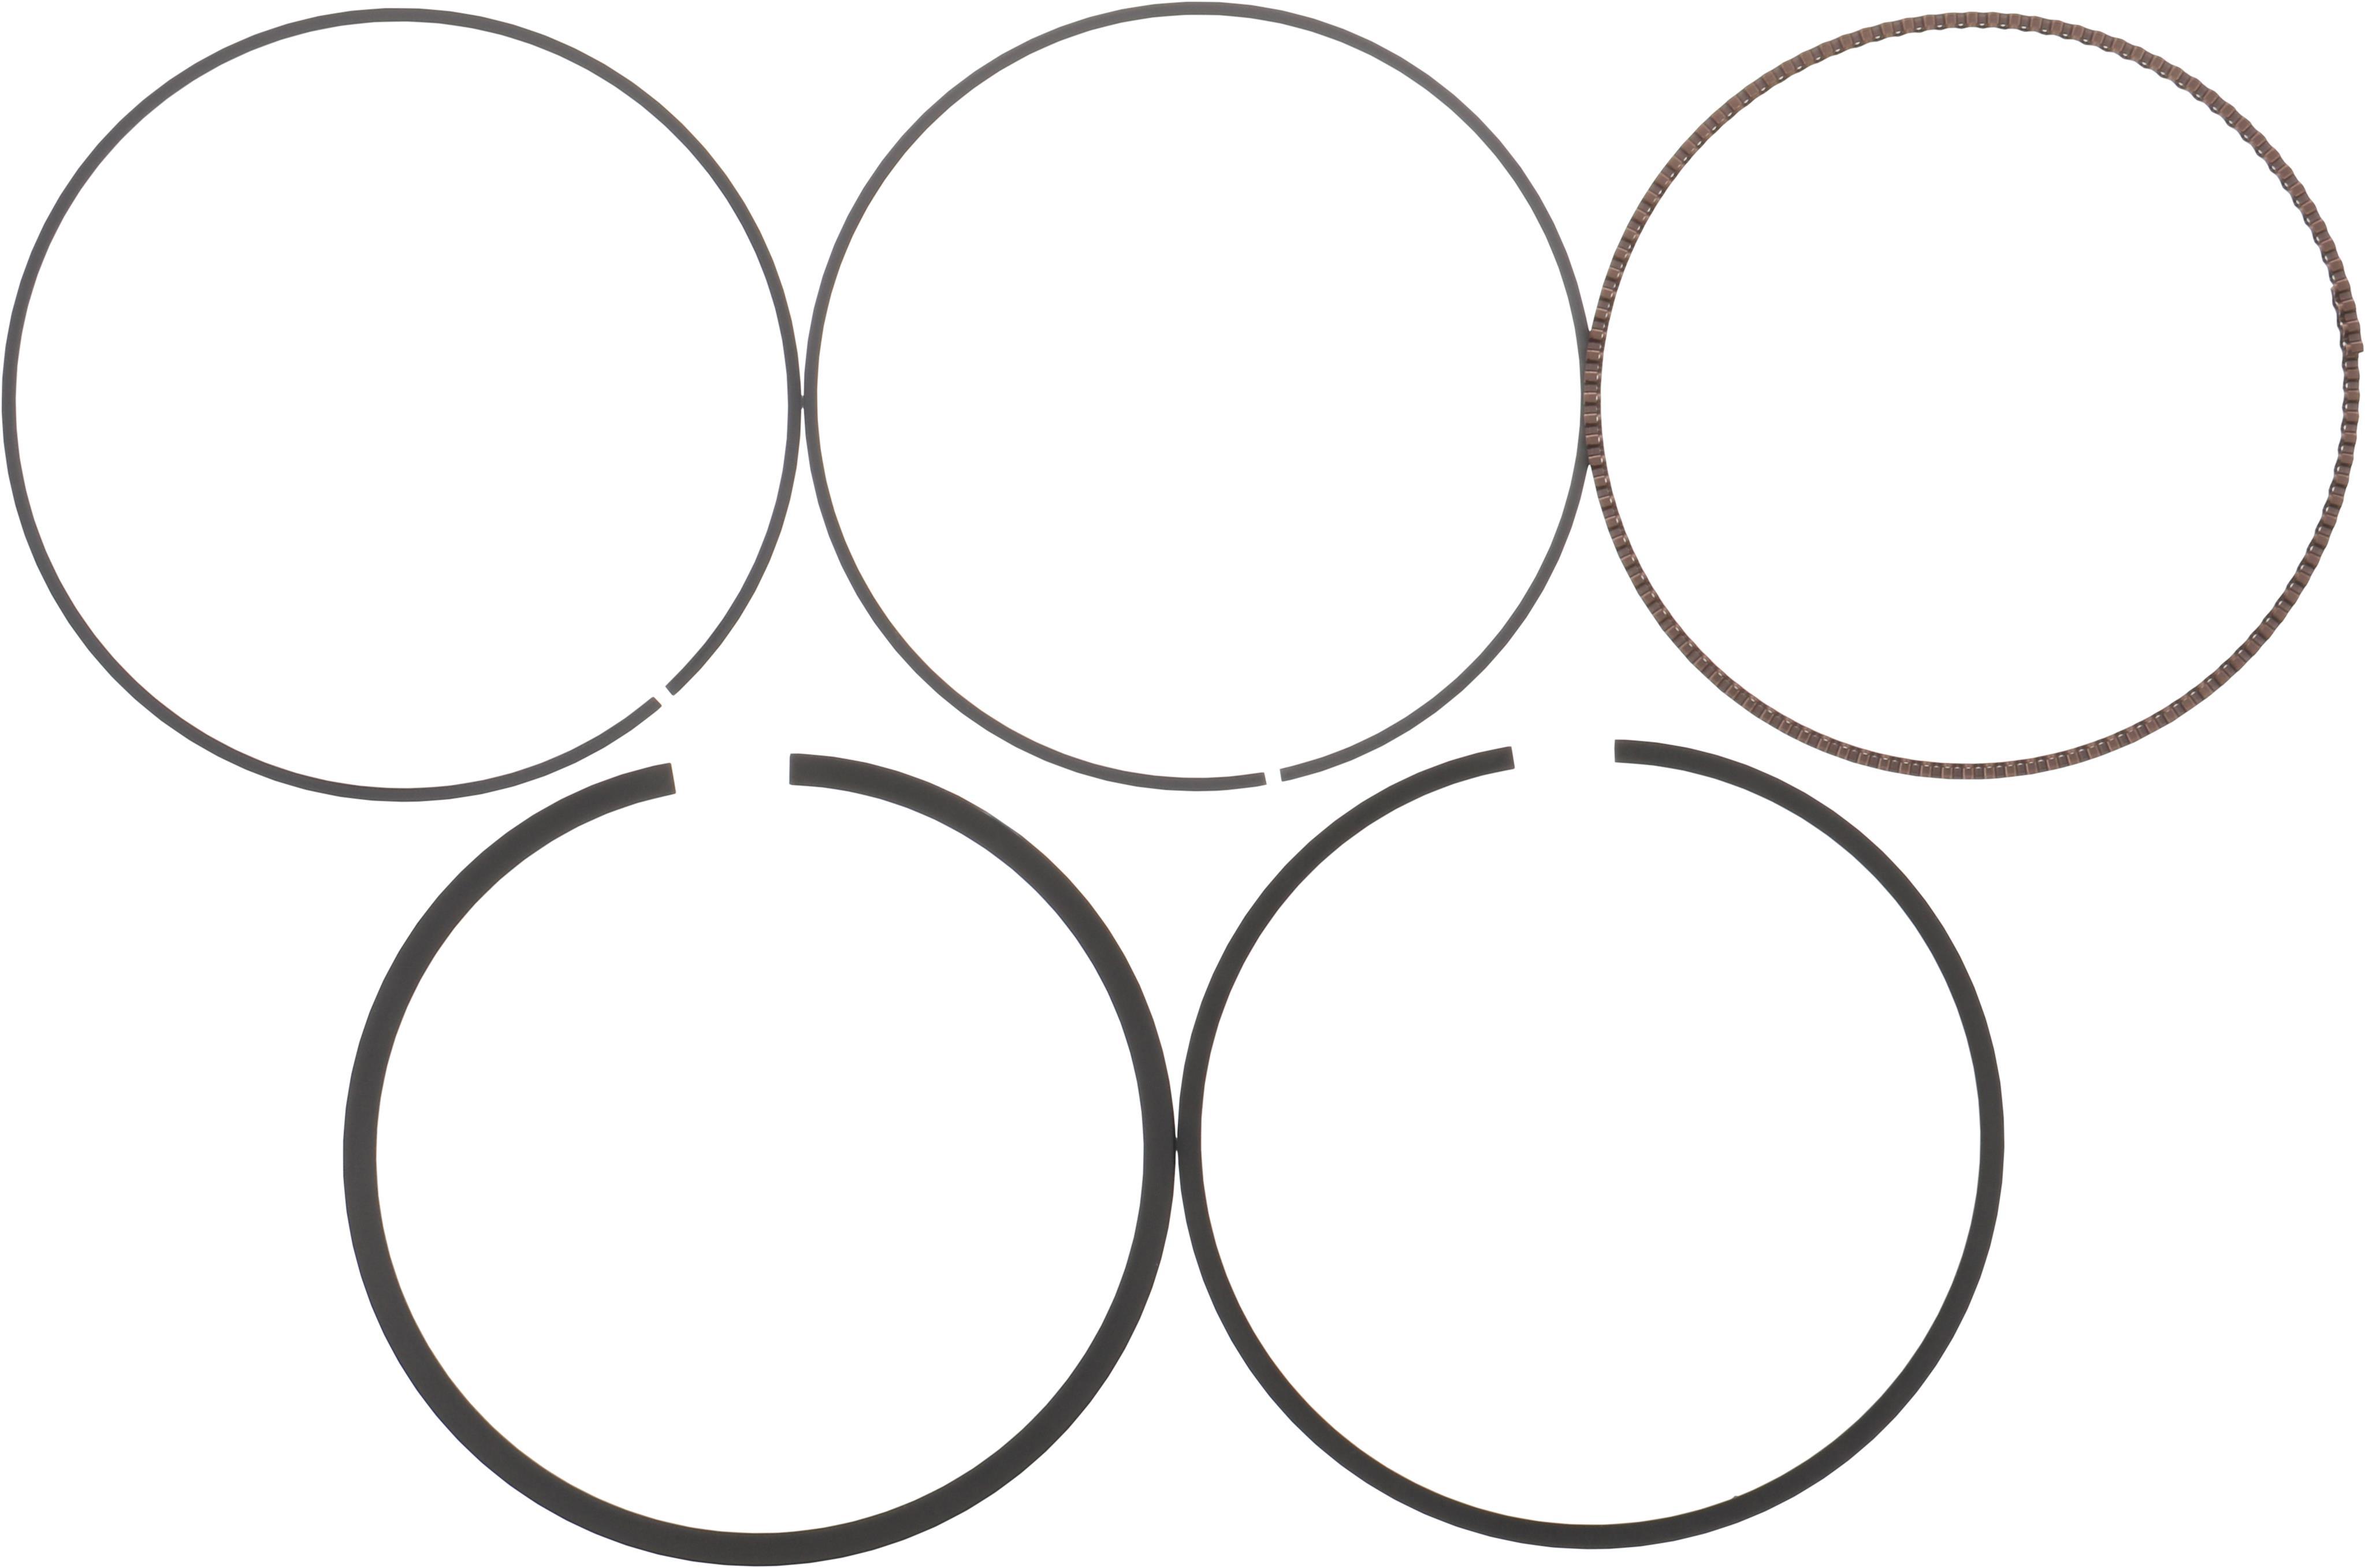 Nissan Altima Engine Piston Ring Illustration Flywheel